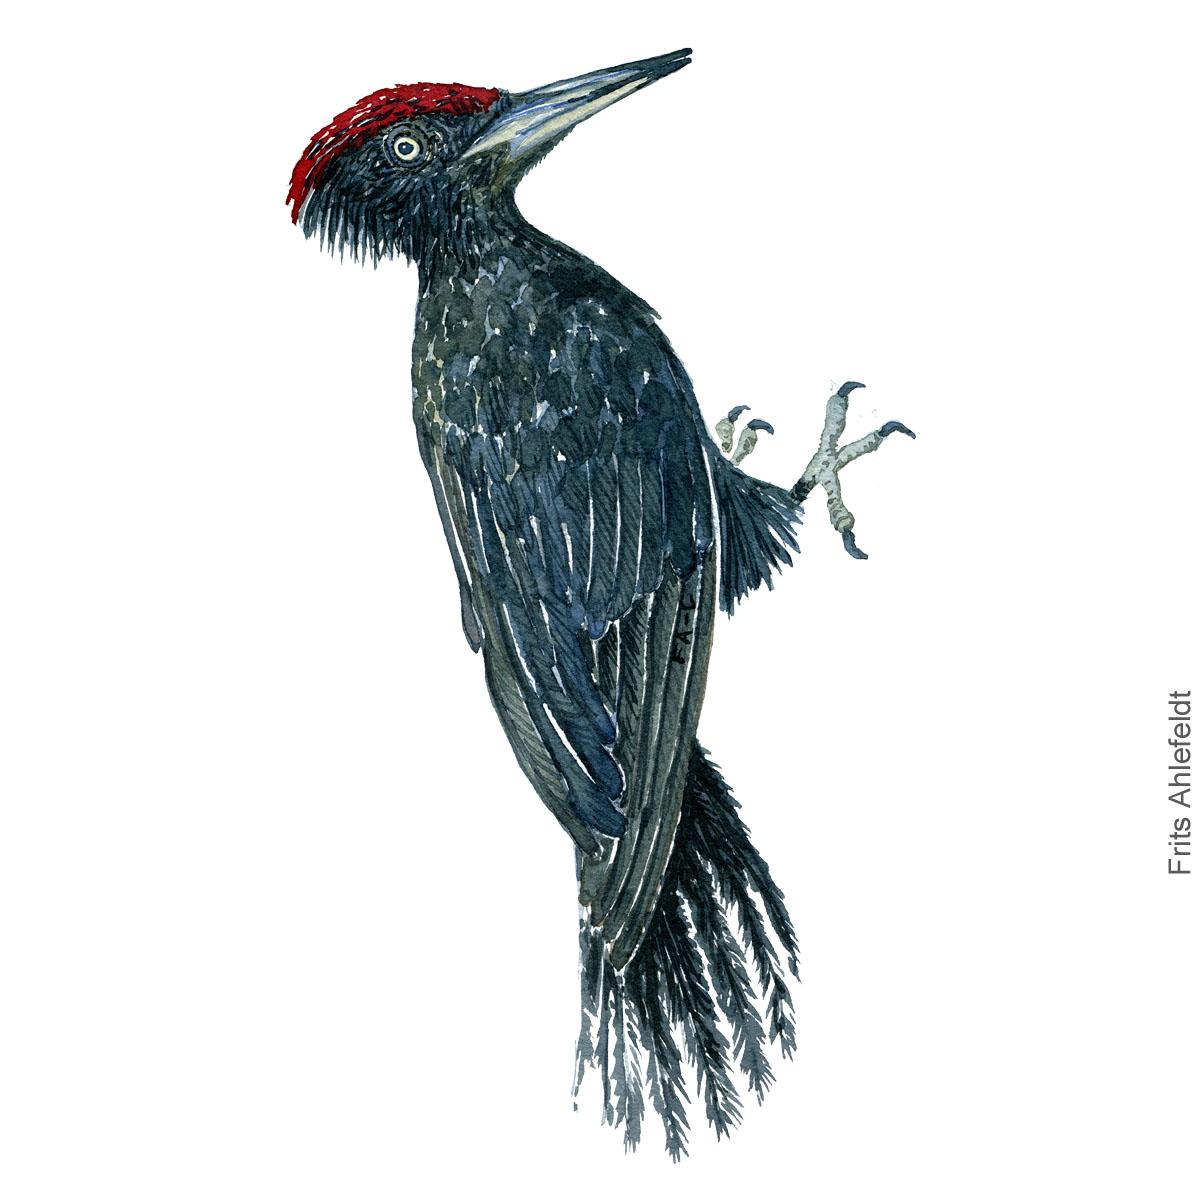 Sortspaette - Black woodpecker - Bird watercolor painting. Artwork by Frits Ahlefeldt. Fugle akvarel